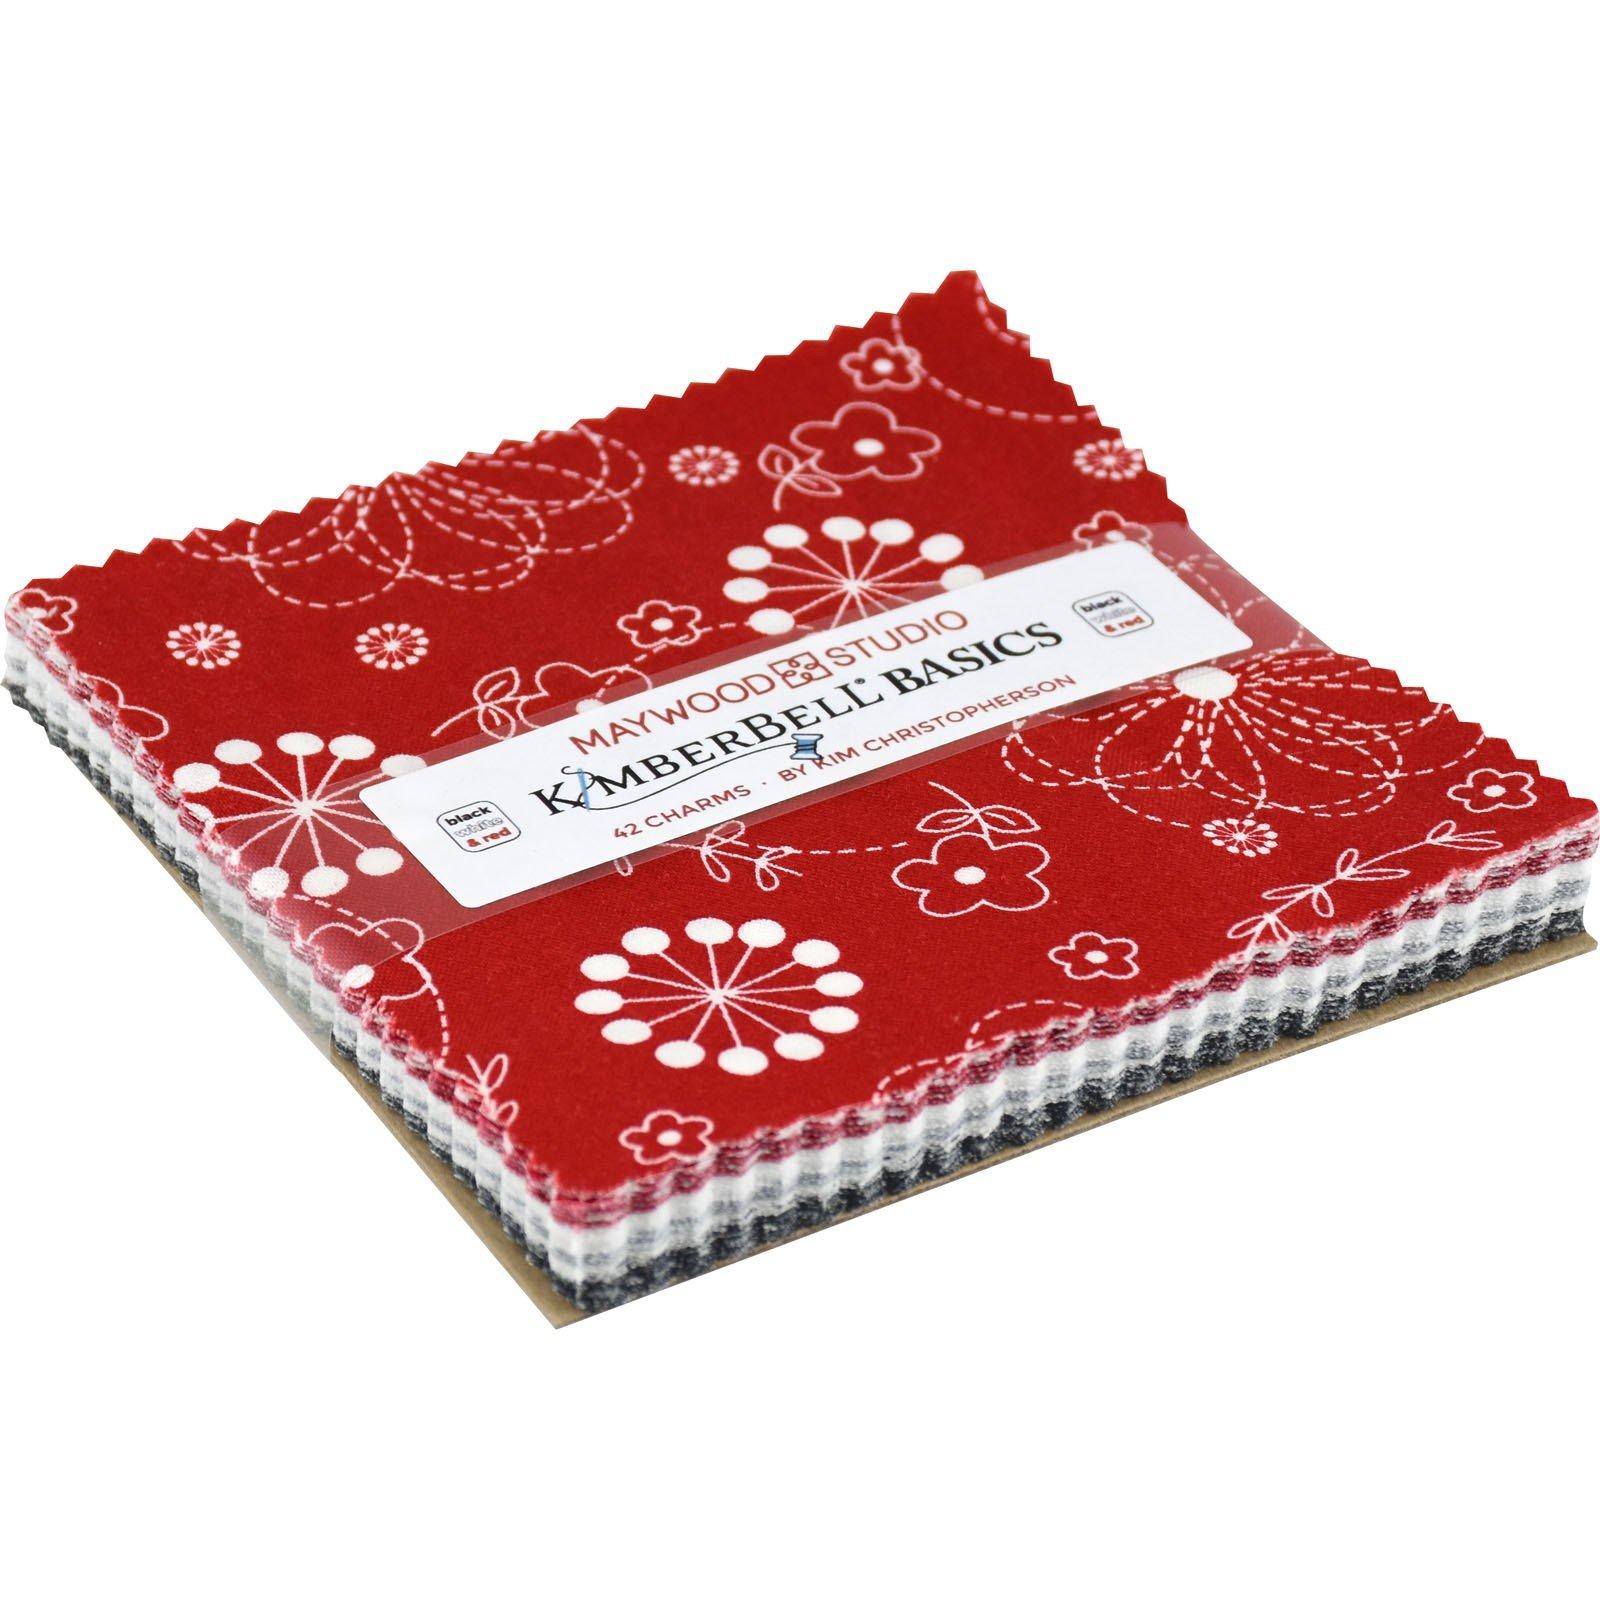 Mini Charm Pack - Kimberbell Black/White/Red<br/>Maywood Studio